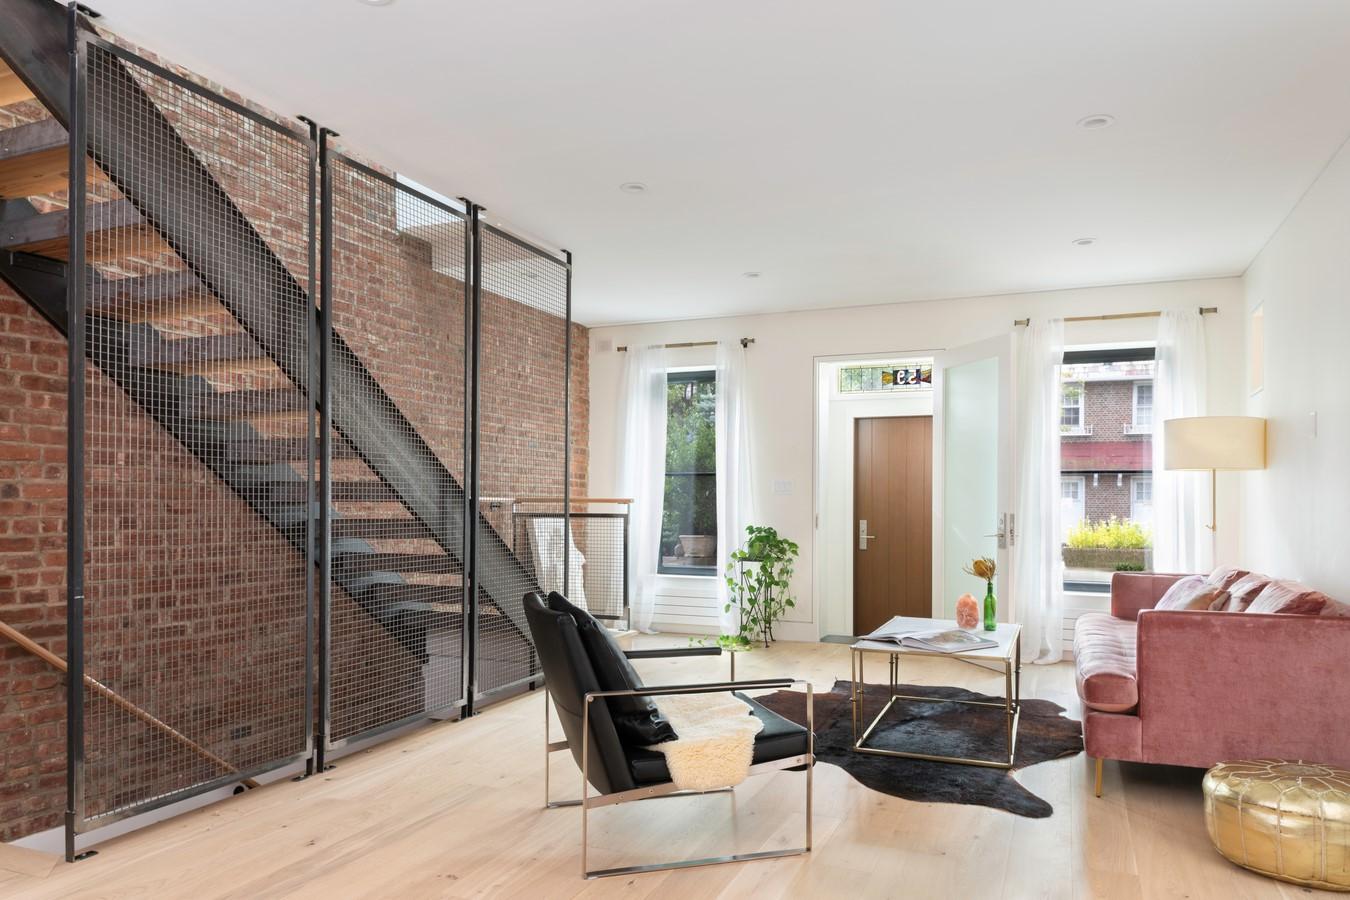 Prospect Lefferts Brick Townhouse by Ben Herzog - Sheet1